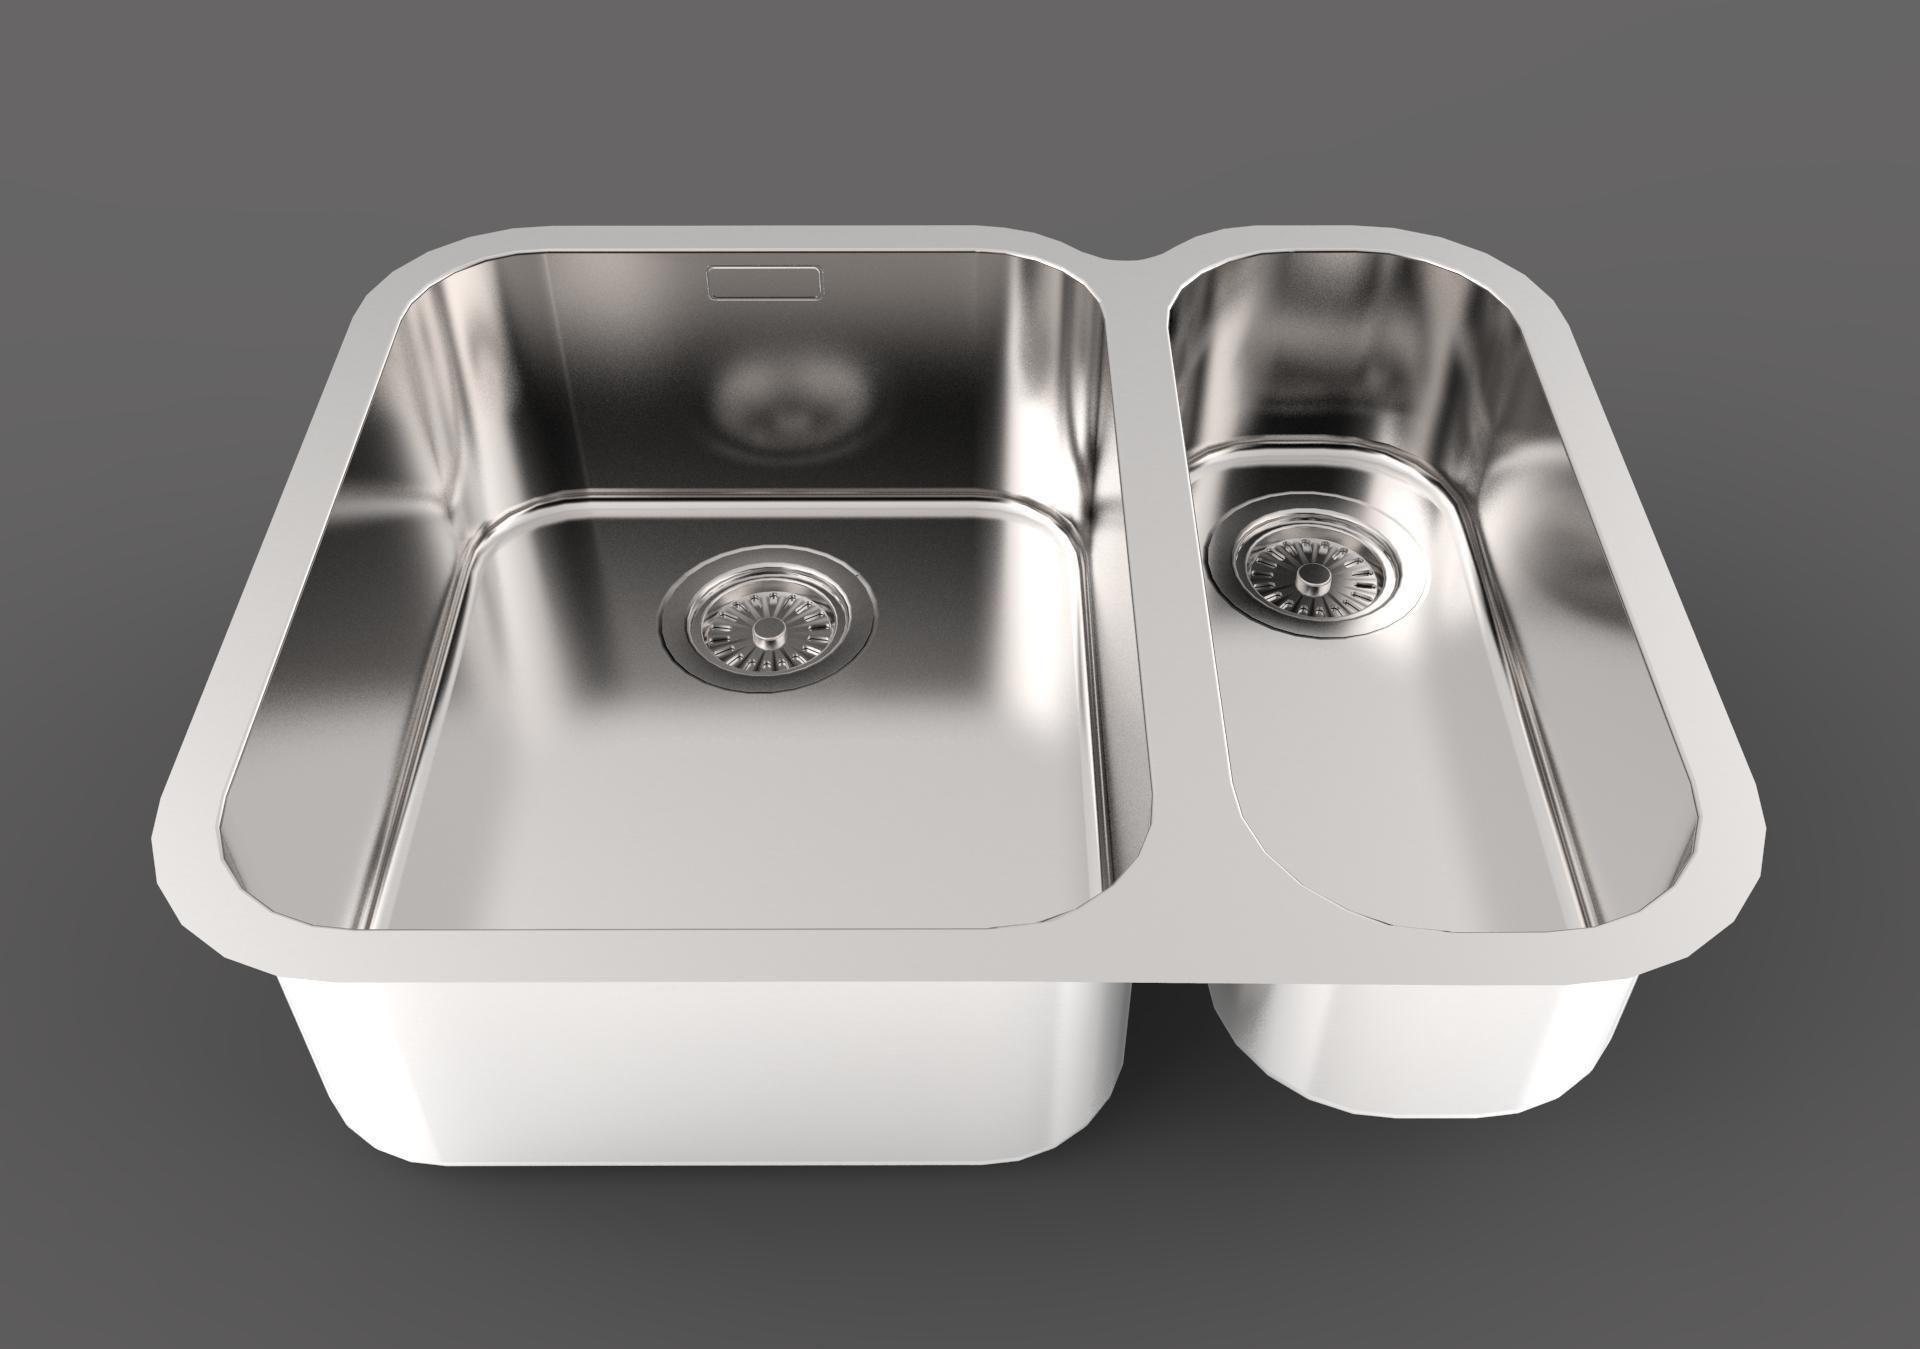 Franke Ariane Arx 160 D Built In Sink 3d Model Max Obj 3ds Fbx C4d Dae ...